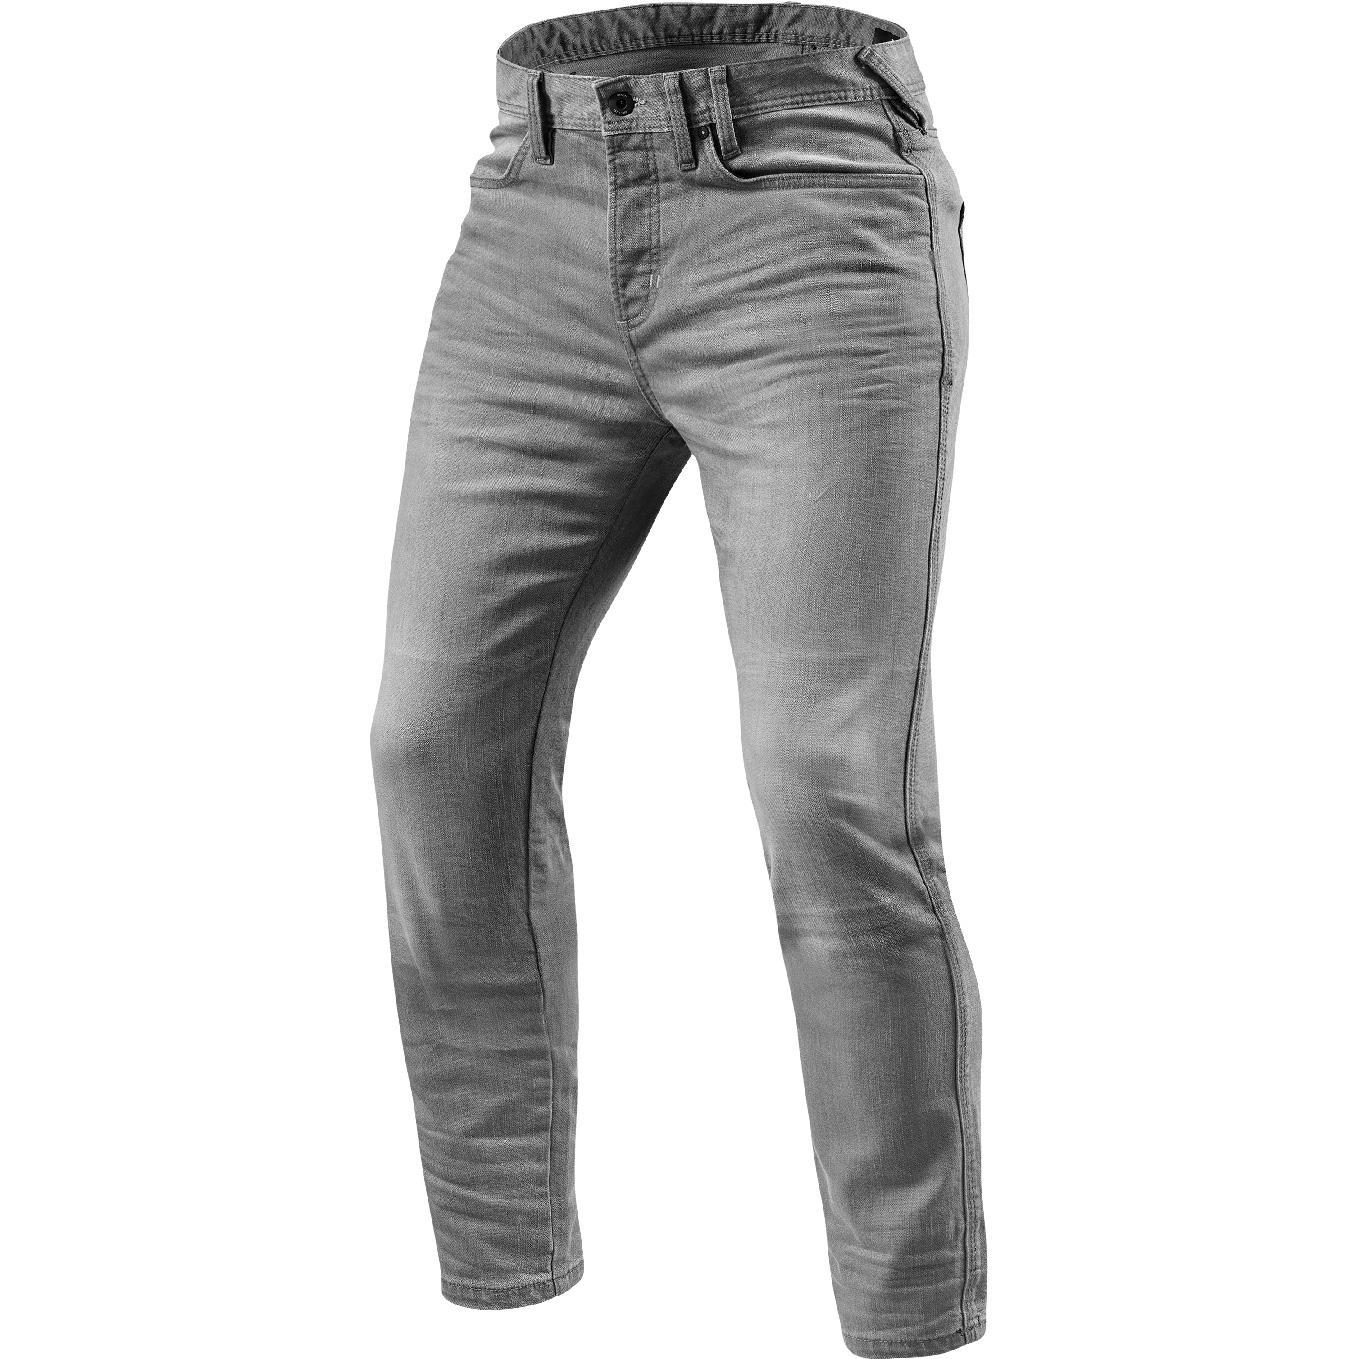 Jeans PISTON SK L34 REVIT